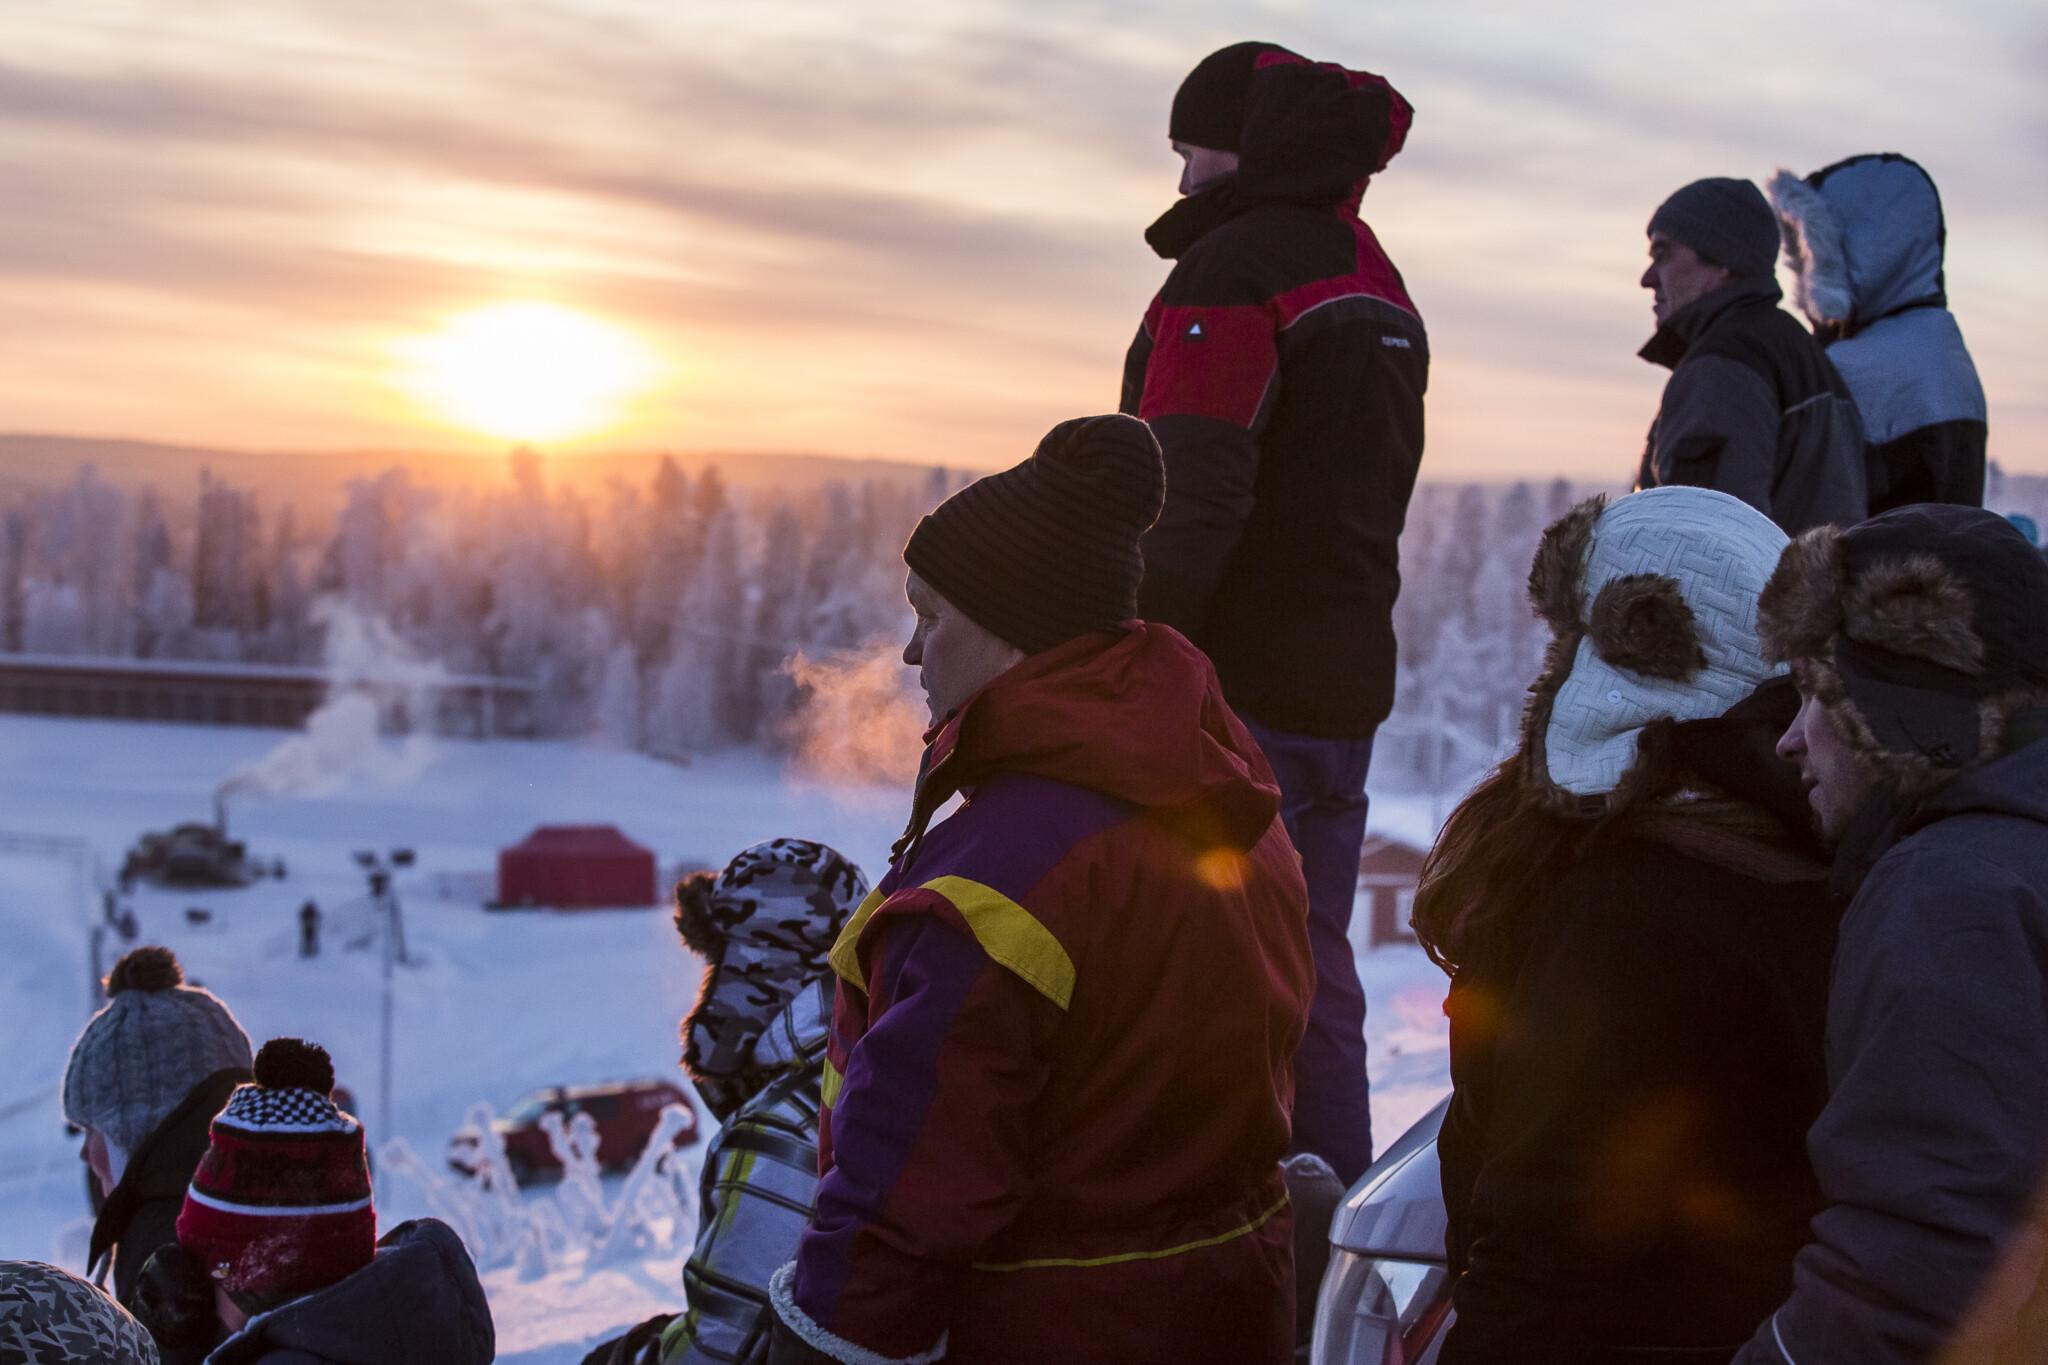 Arctic Lapland Rally 2015 in Rovaniemi Lapland Finland (13)